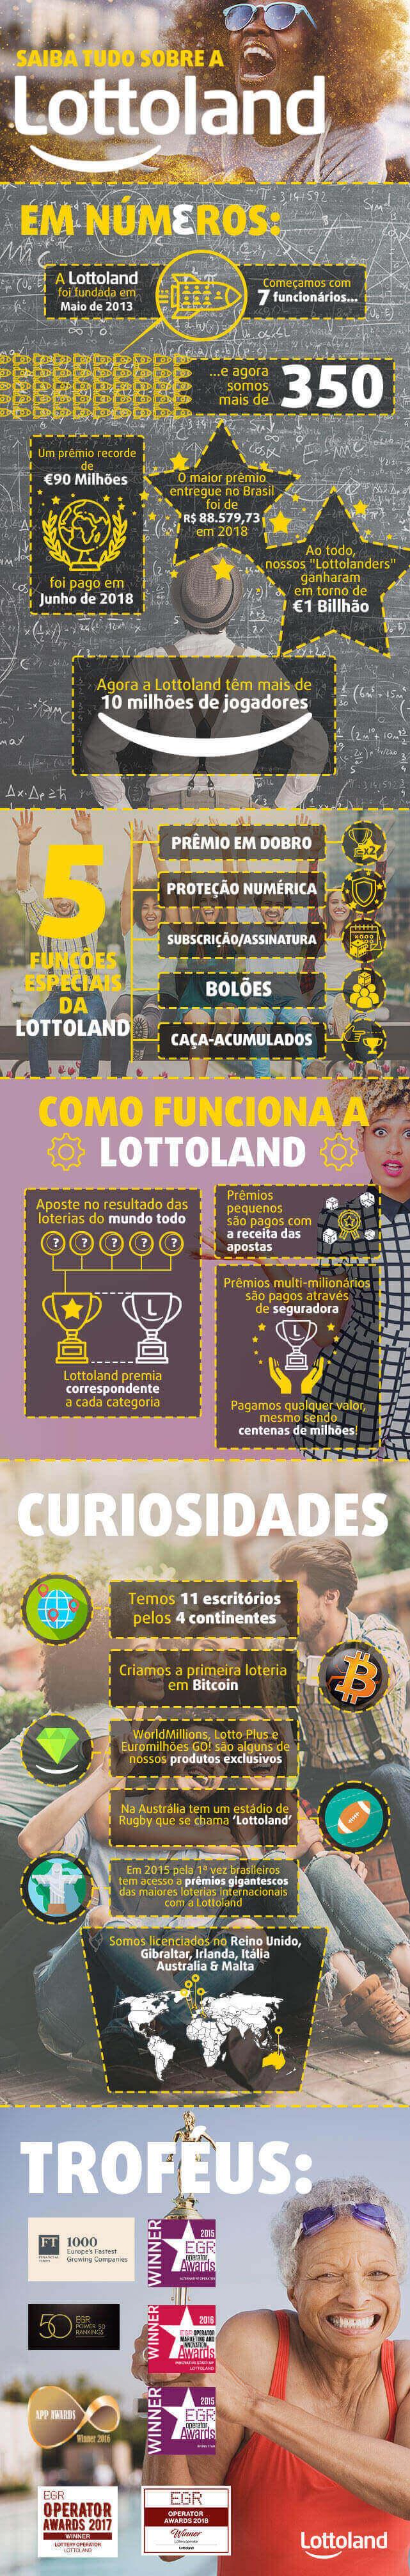 Tudo sobre Lottoland - infográfico